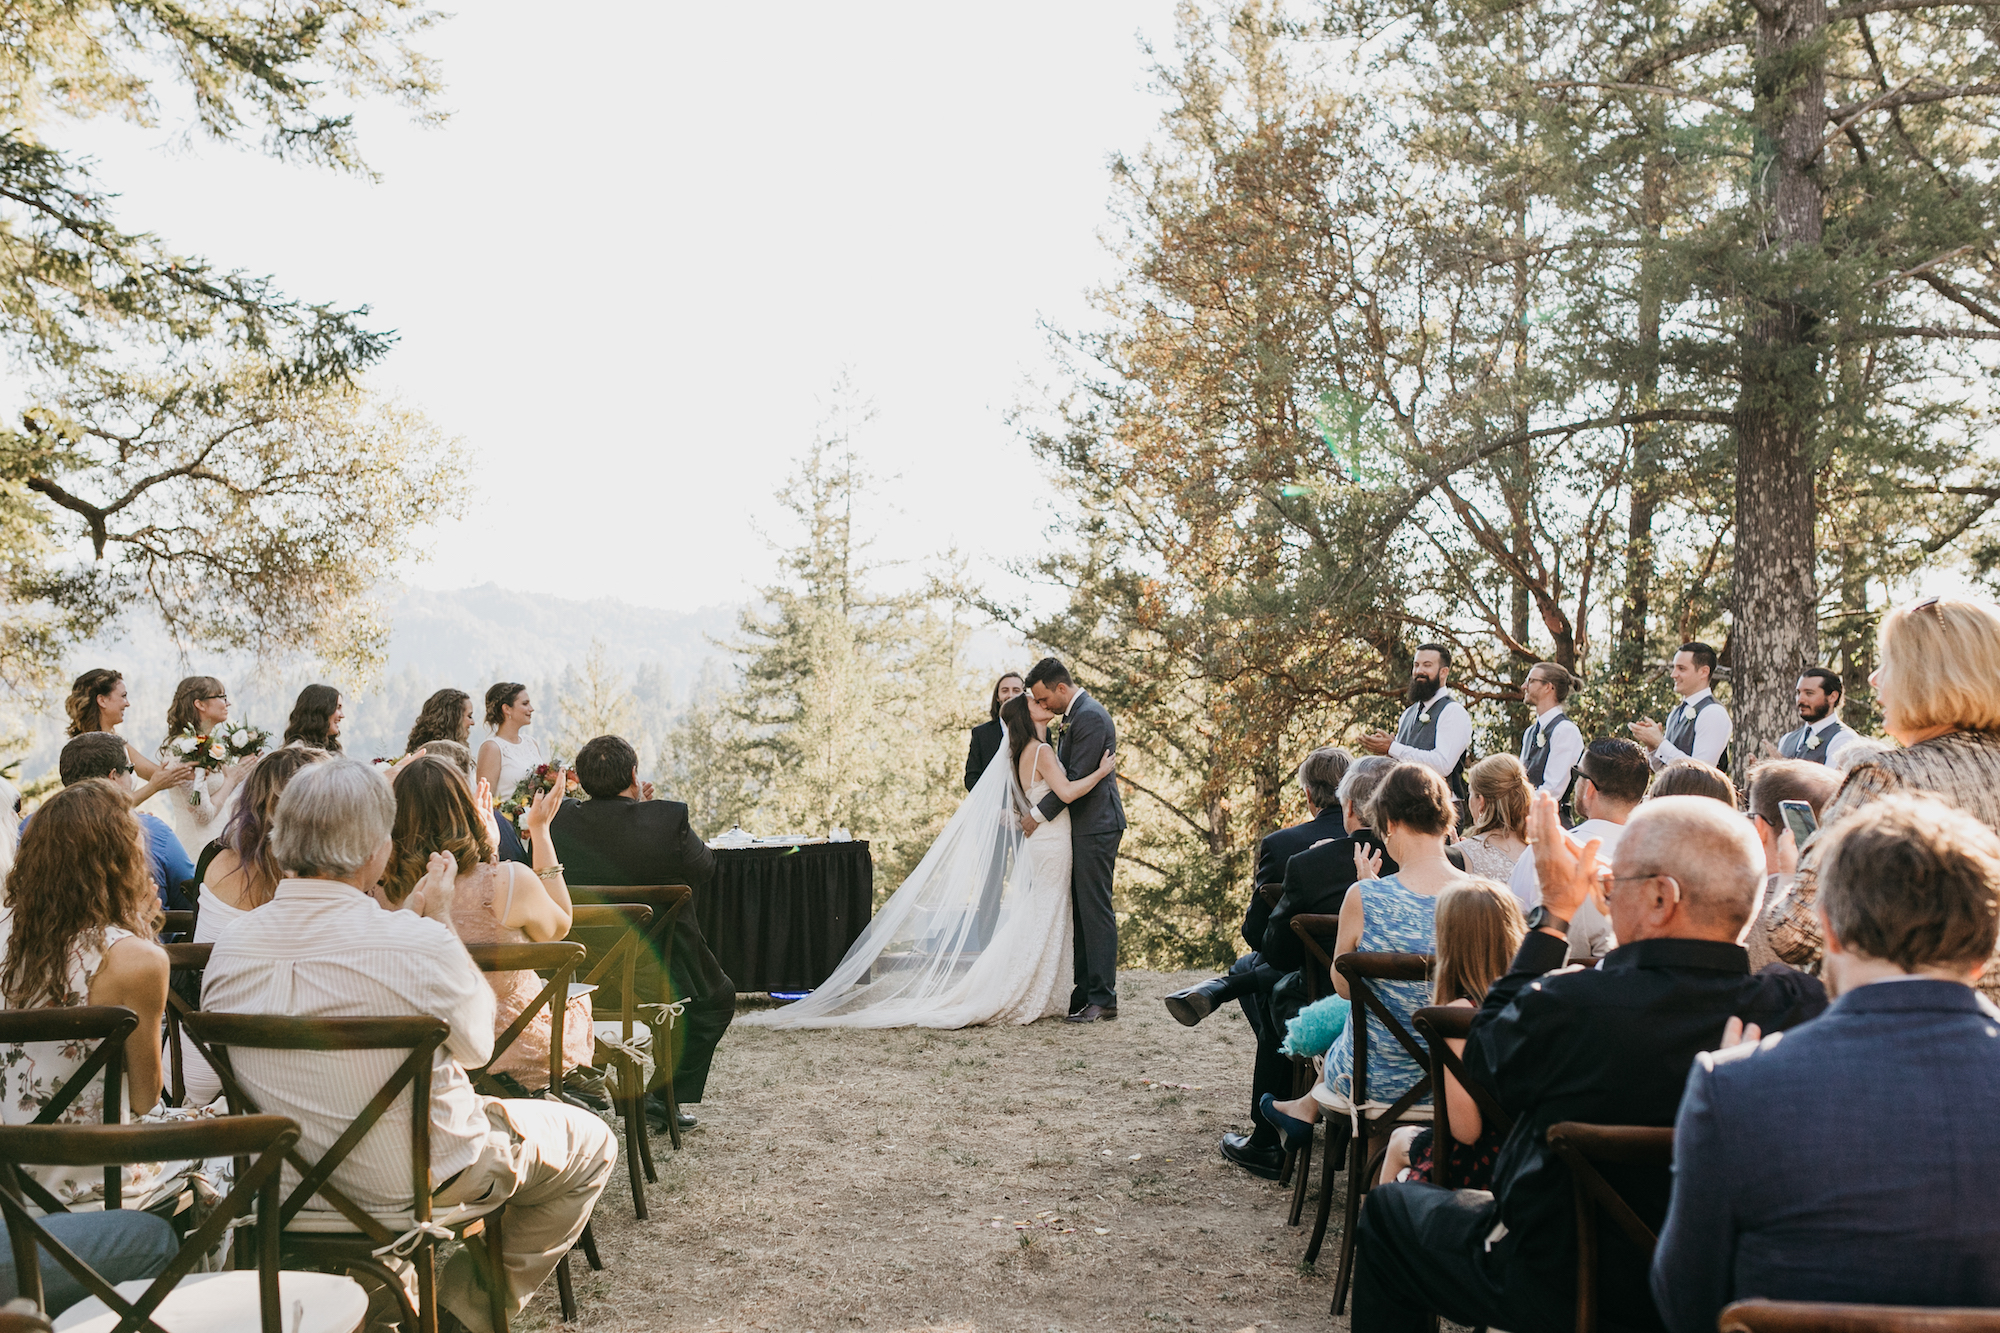 anvil-vineyards-wedding-photographer469.jpg